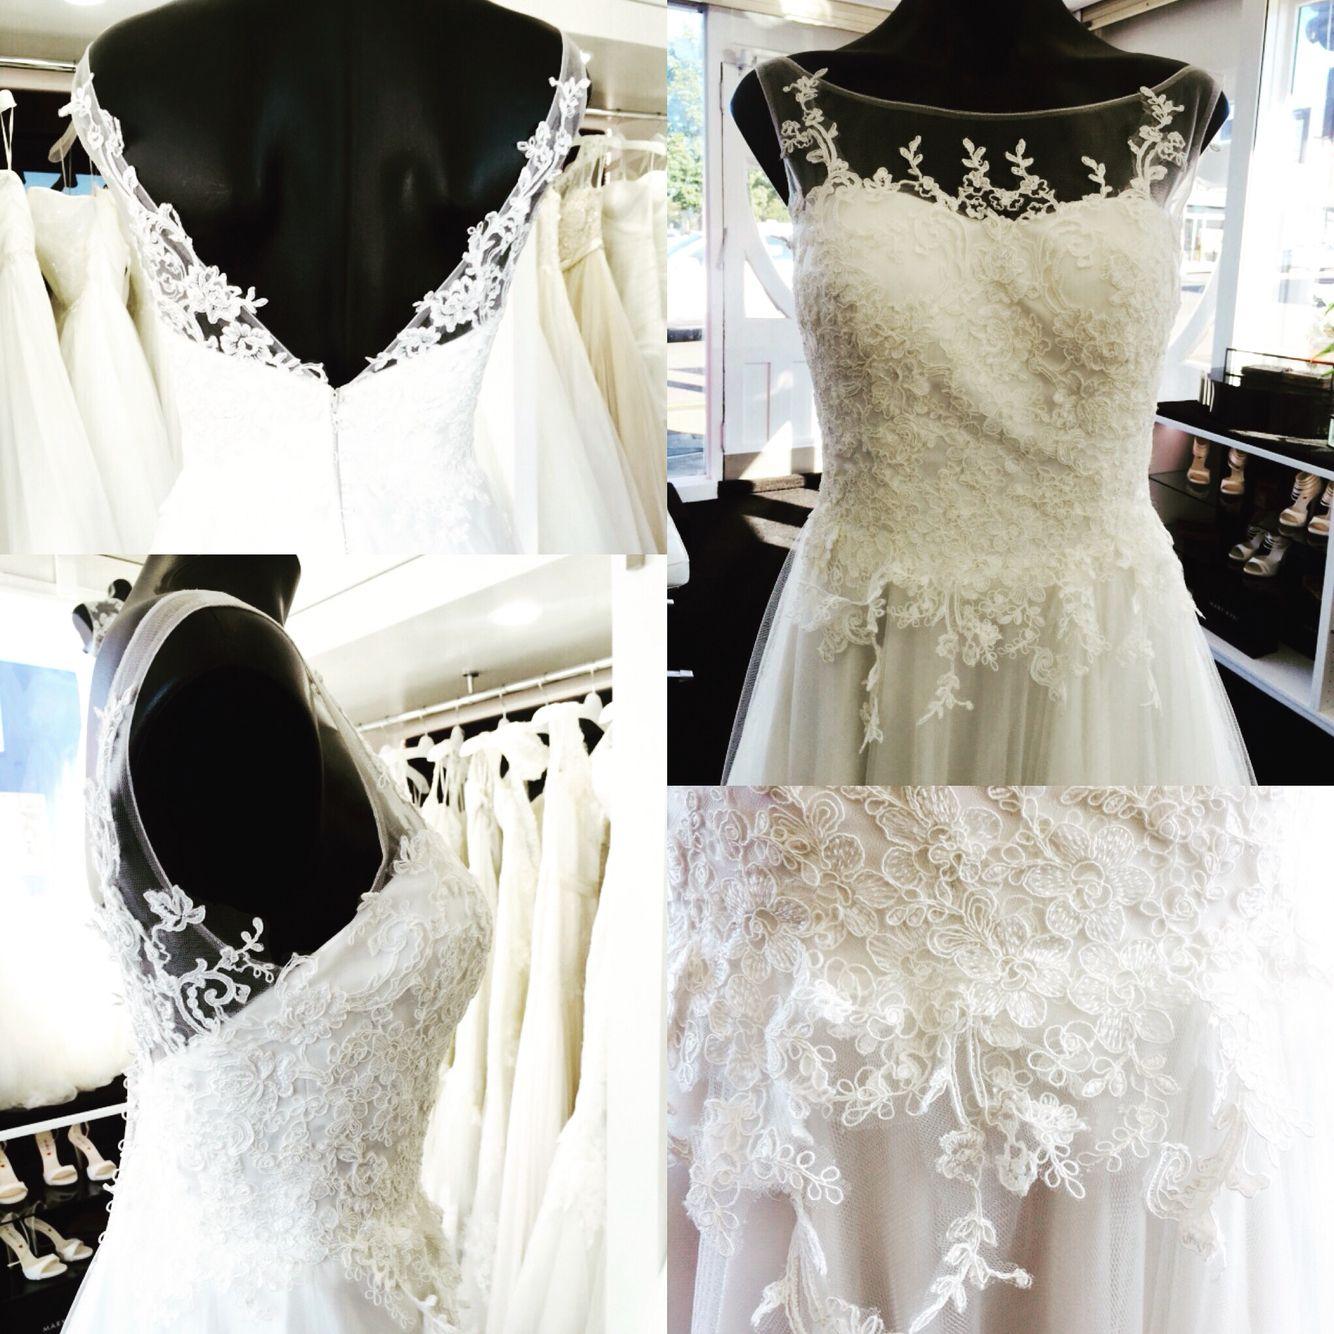 Wedding Dresses Queensland: Wedding Dresses, Bridal Gowns, Gowns